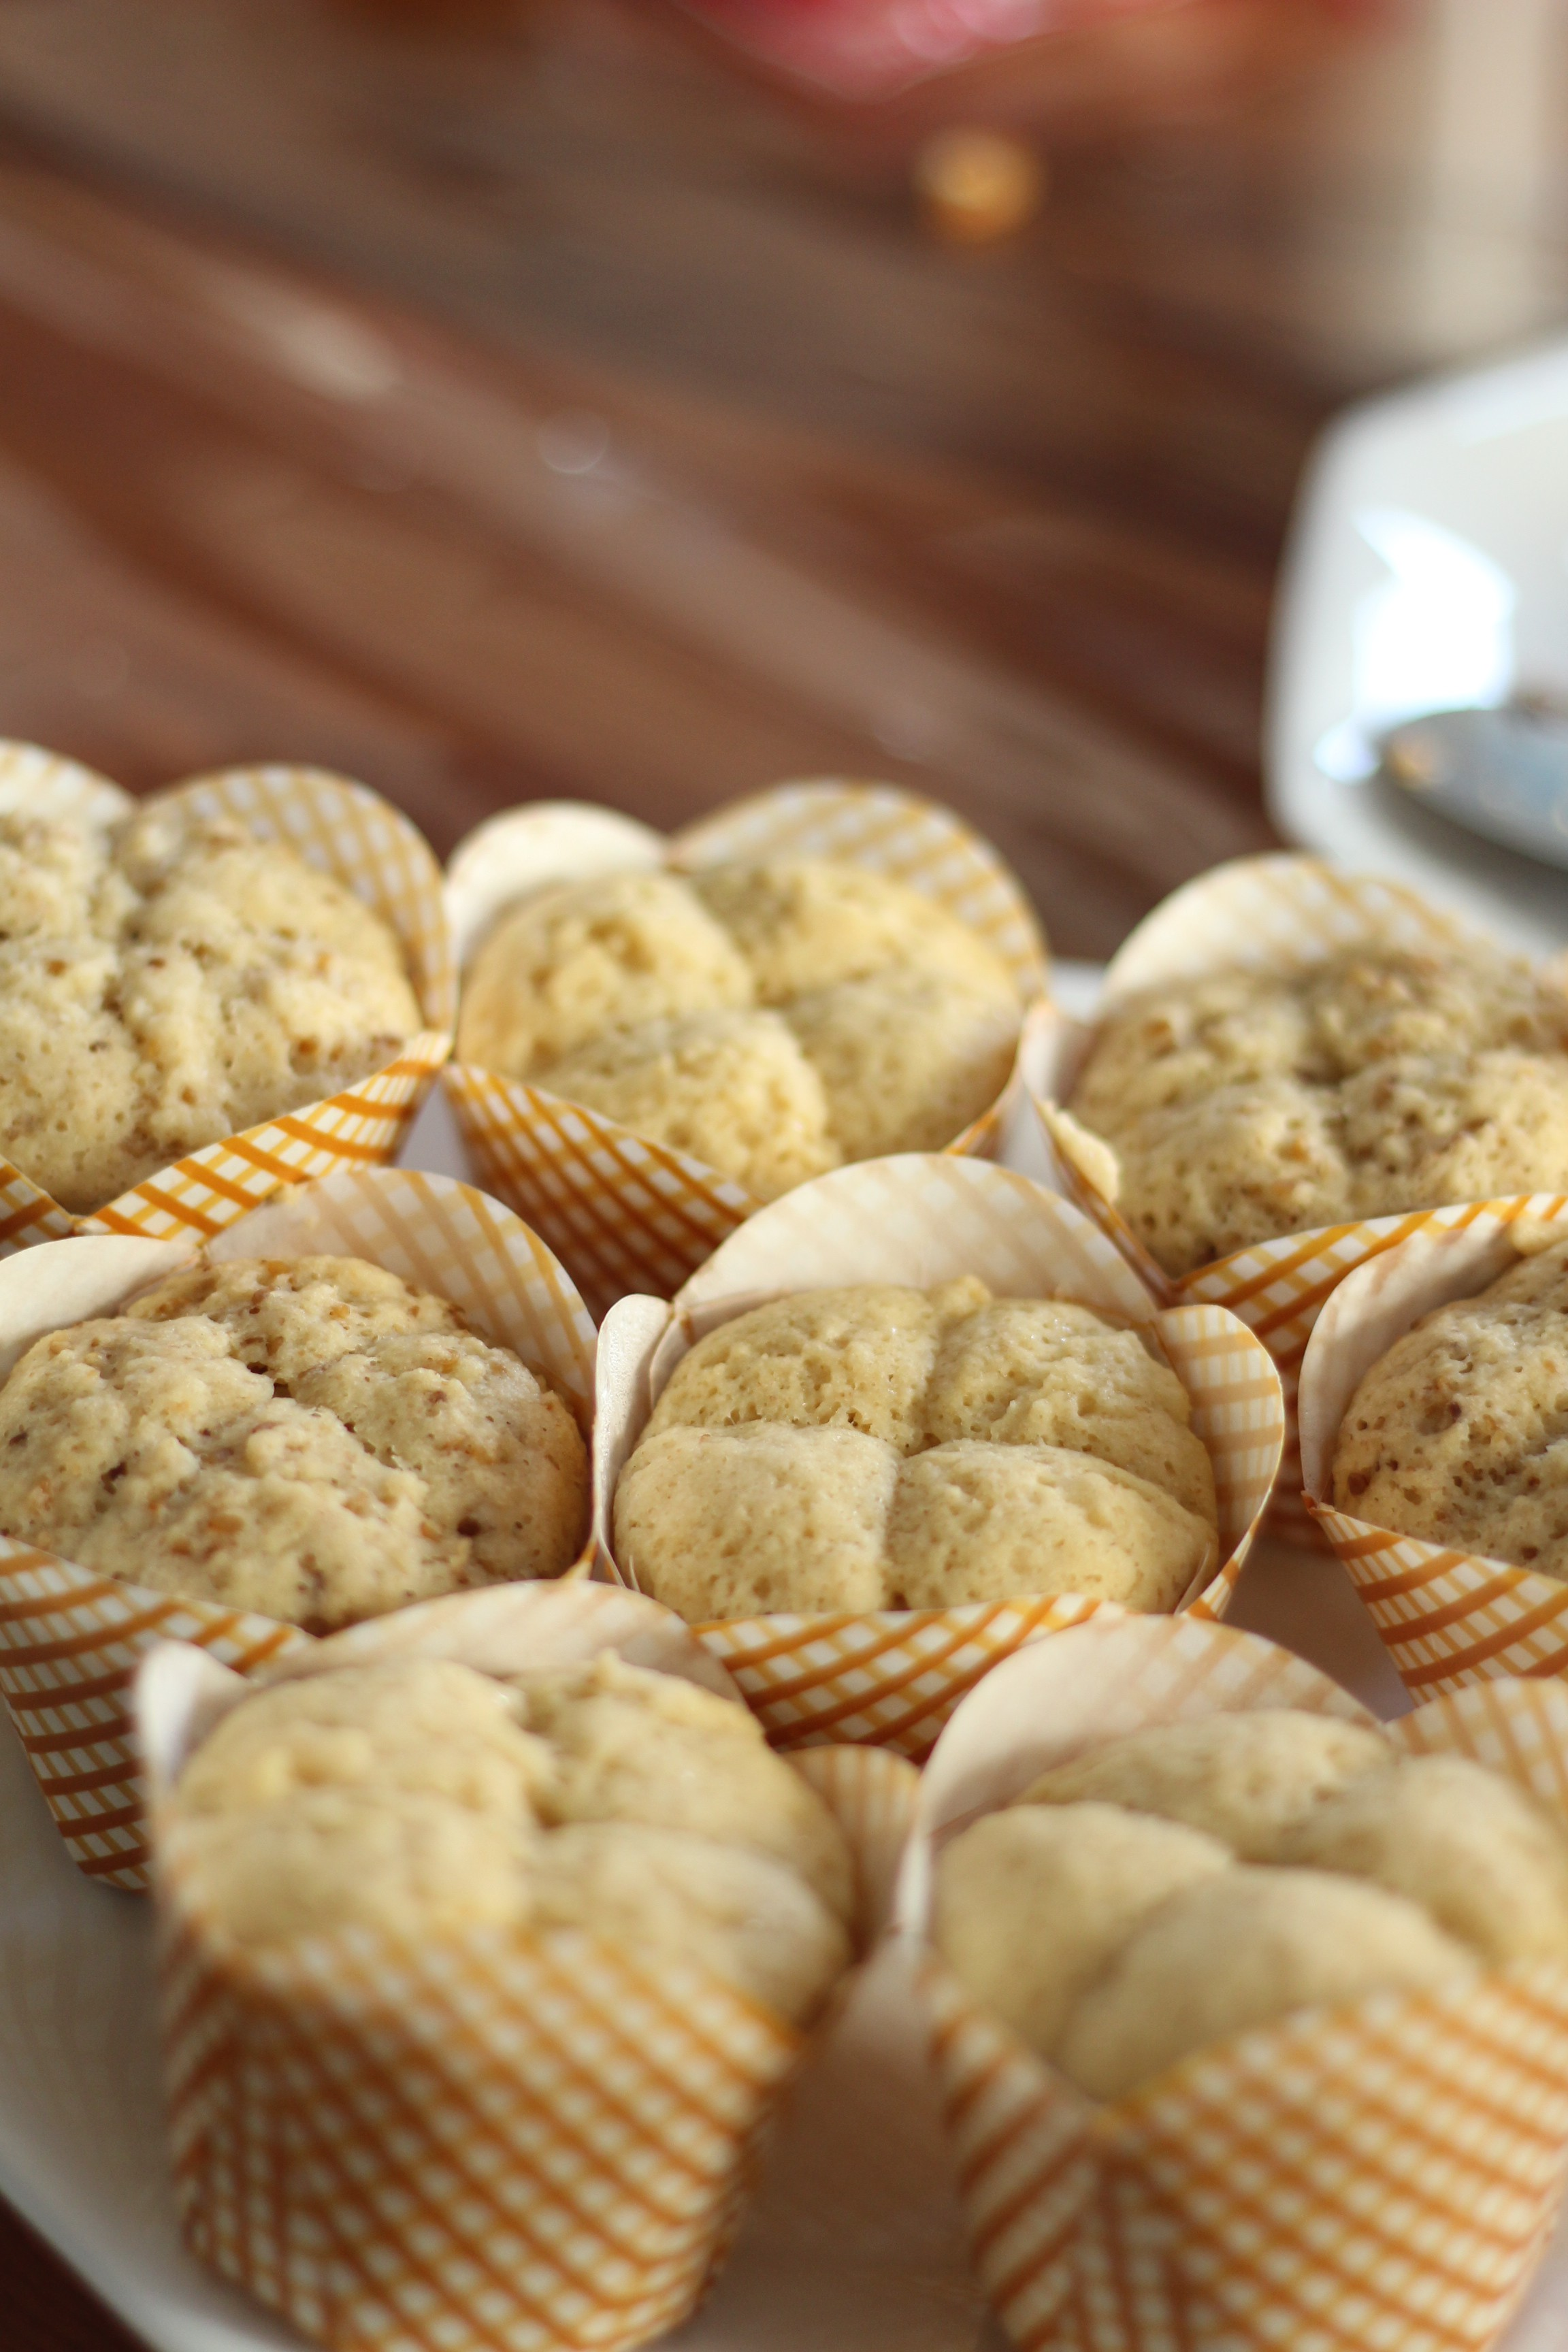 a-ta-sante糖質制限パン料理教室。阿倍野区西田辺。山陰出張、京都江部粉お好み焼き&蒸しパン講習会。